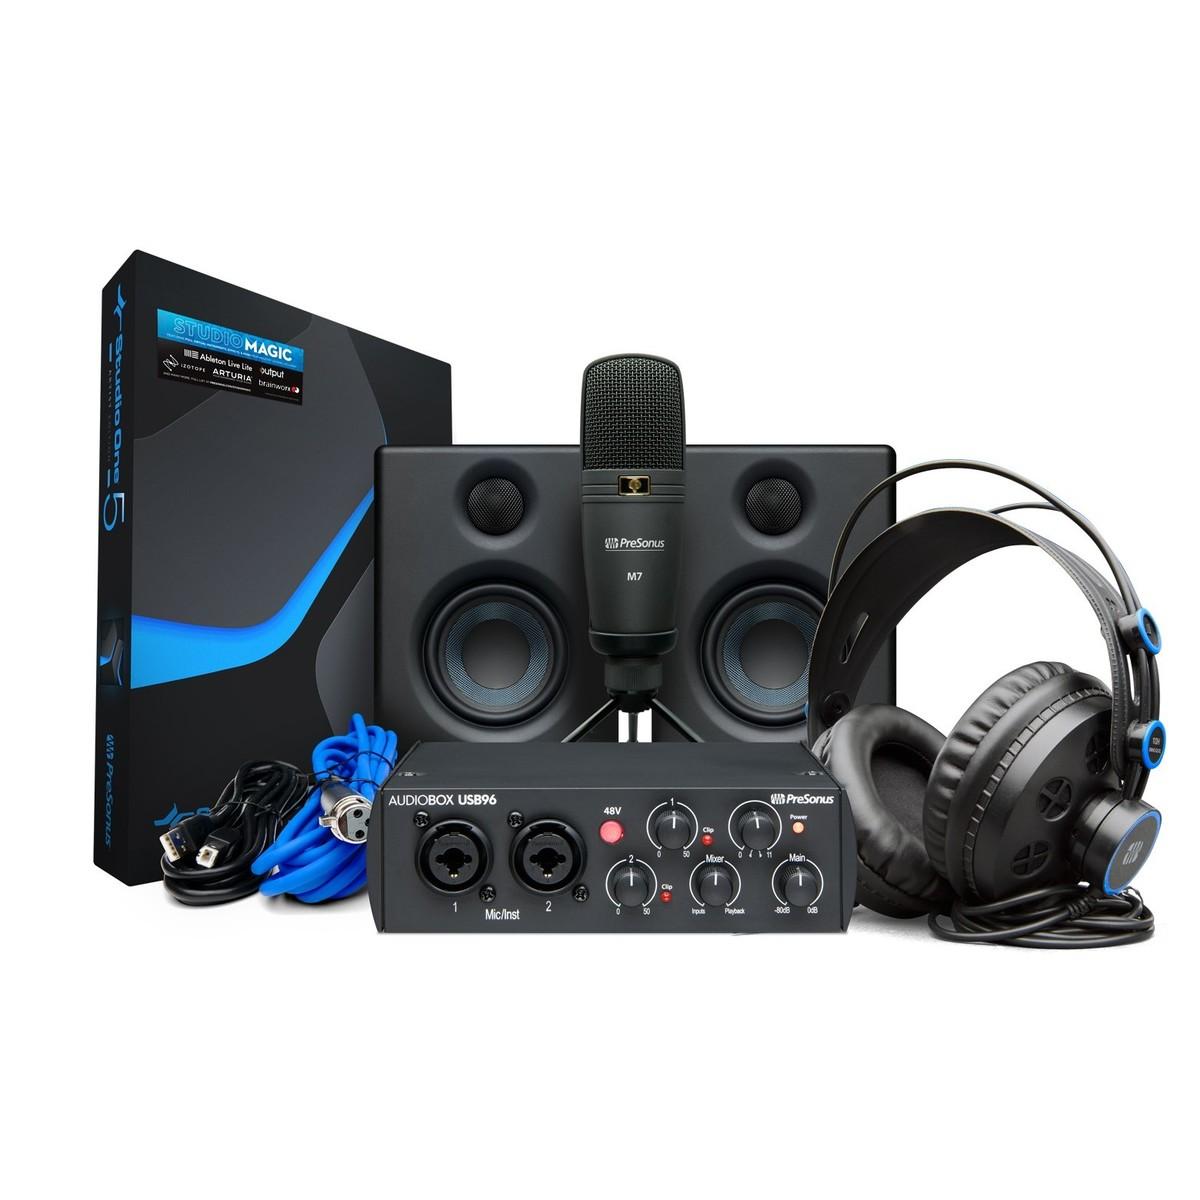 PreSonus AudioBox USB 96, HD7 Headphones, M7 Microphone